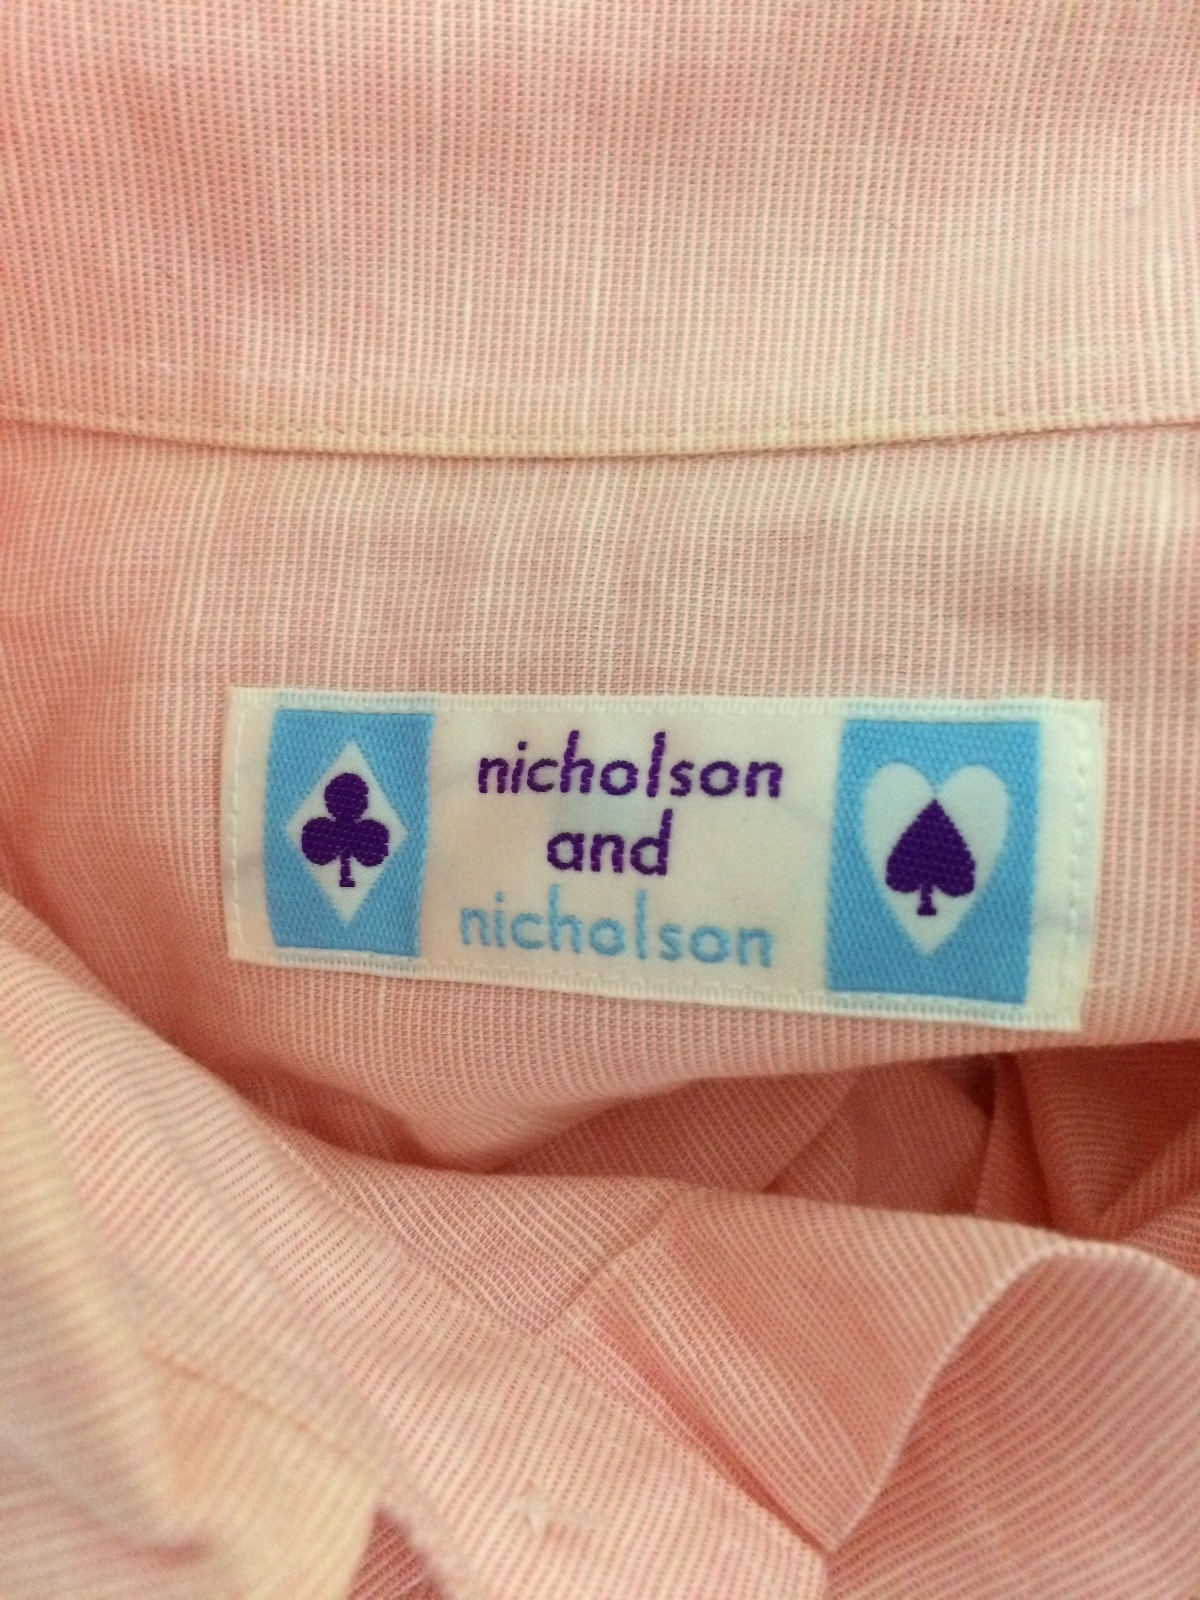 NICO.(nicholson&nicholson)(ニコ(ニコルソンアンドニコルソン))のシャツ